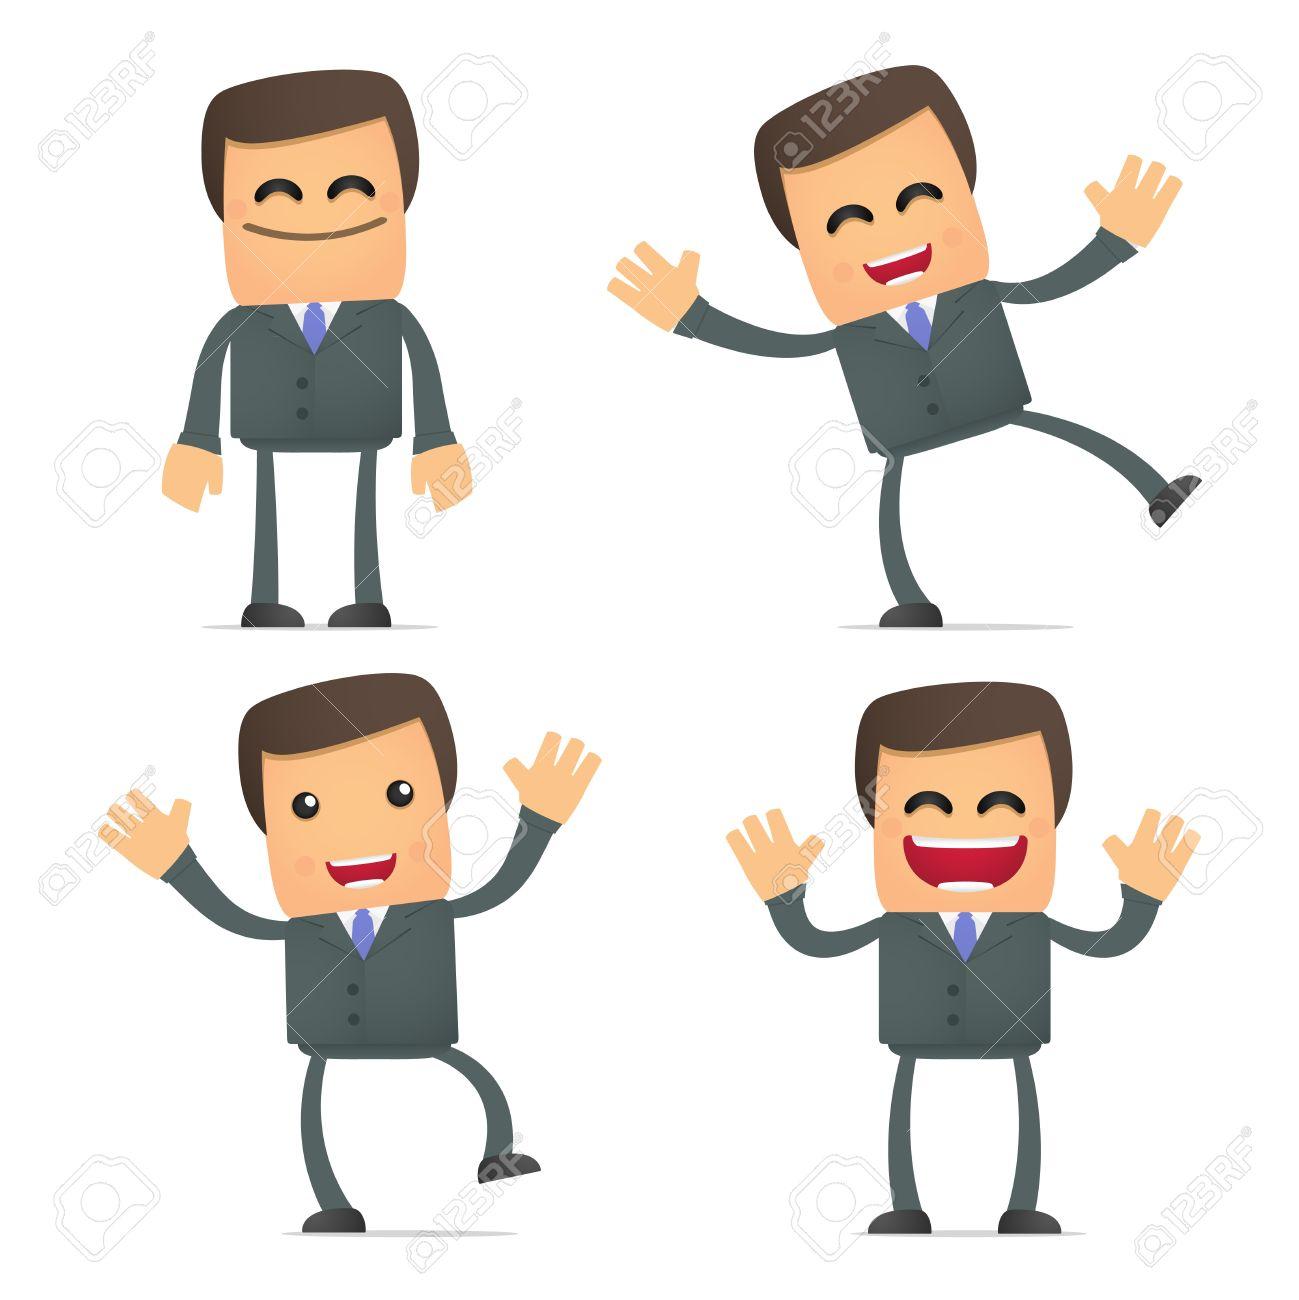 Business team cartoon characters cartoon vector cartoondealer com - Communication Cartoon Businessman Dancing And Jumping From Joy